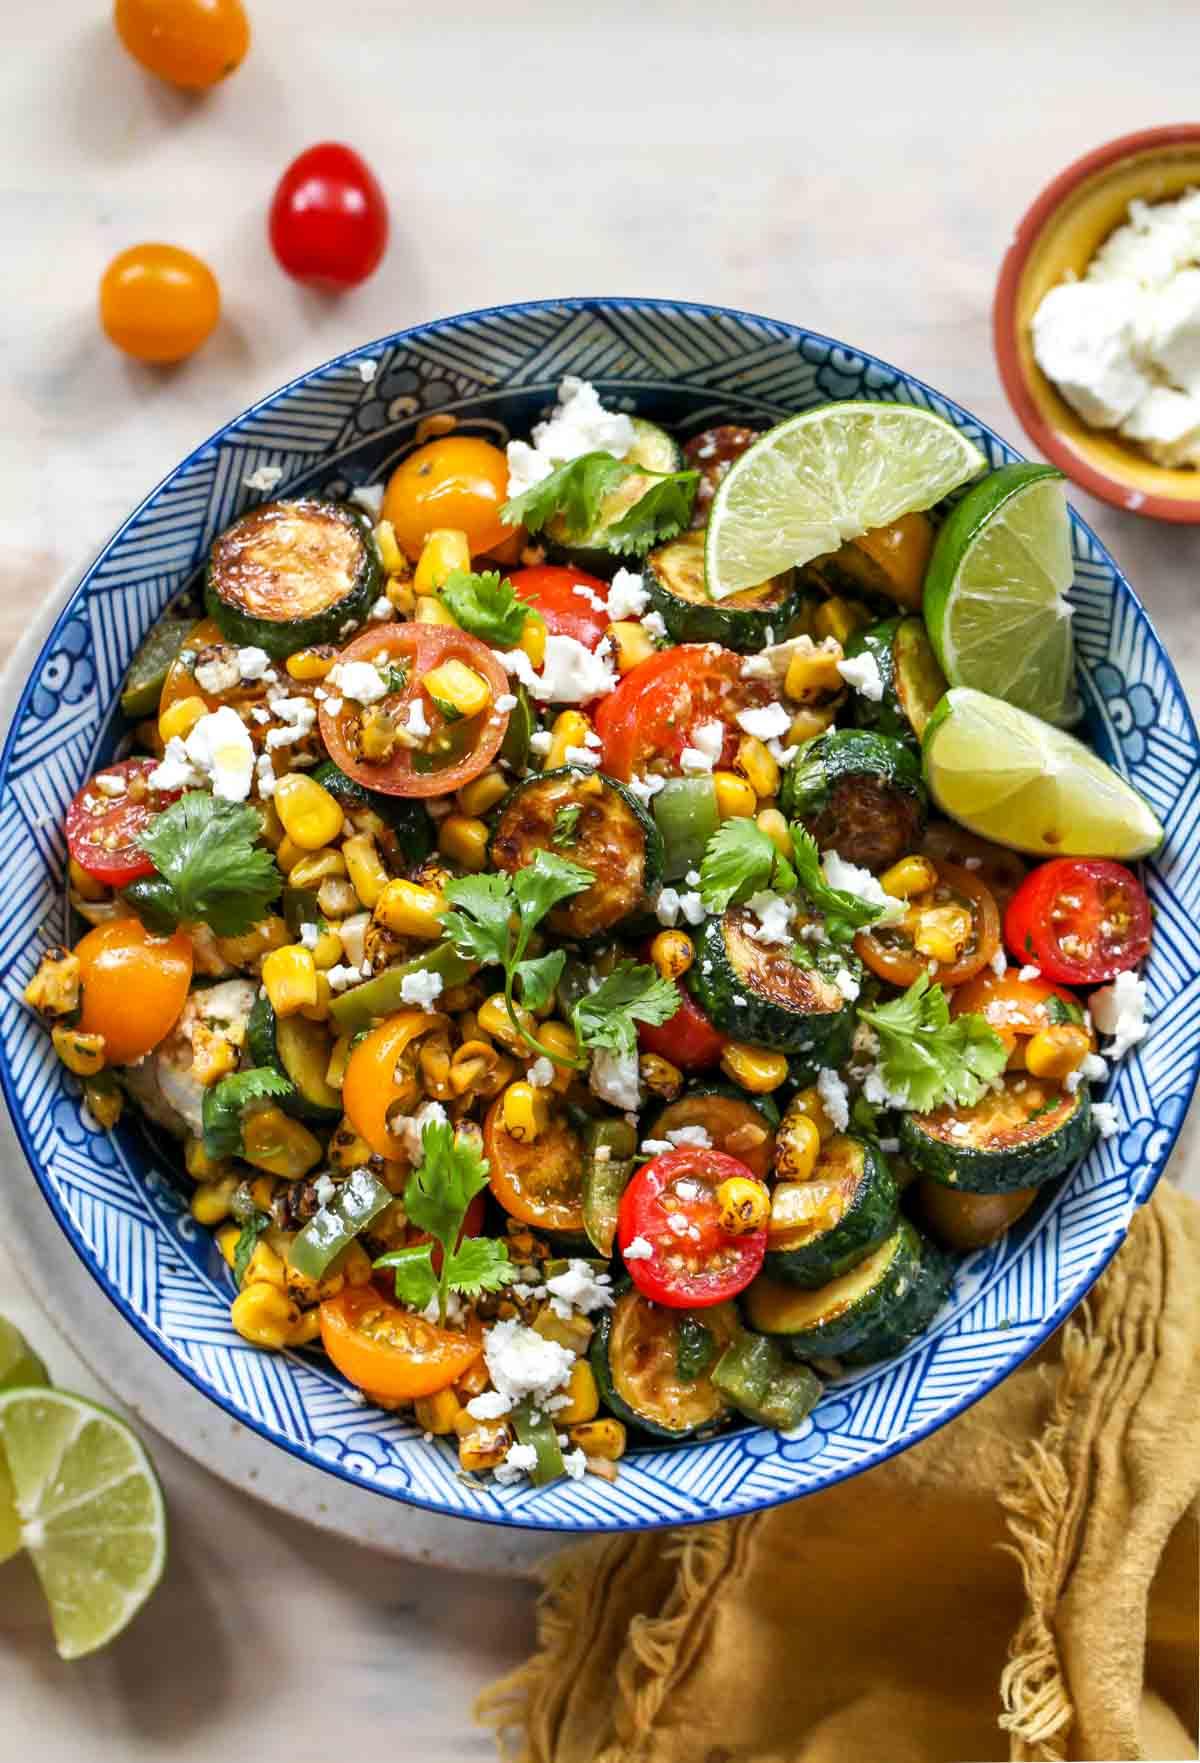 Summer Squash & Corn Fiesta Salad